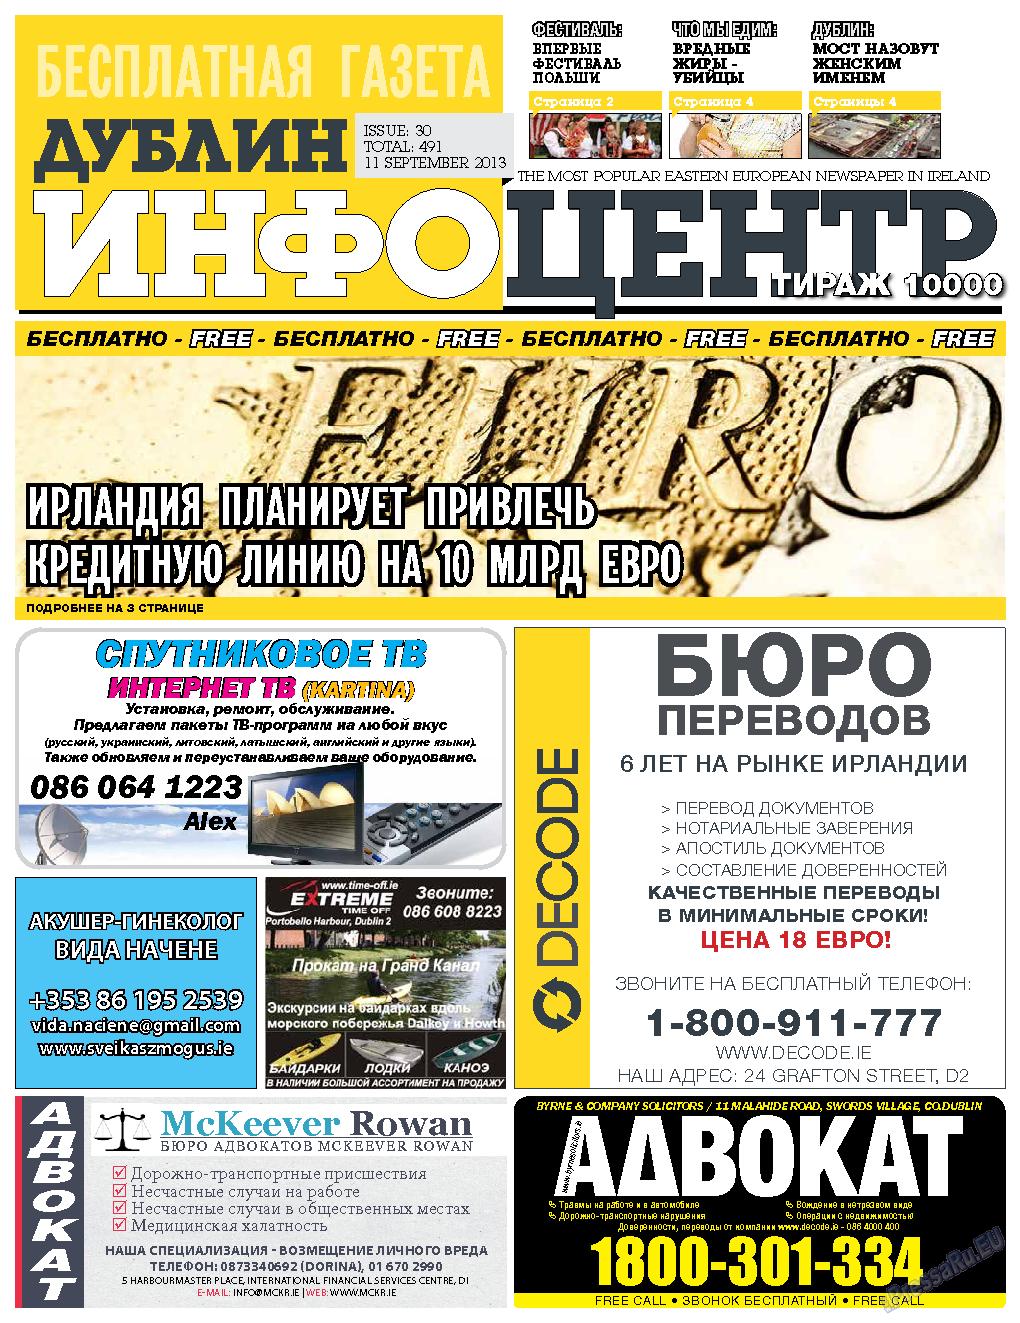 Дублин инфоцентр (газета). 2013 год, номер 30, стр. 1